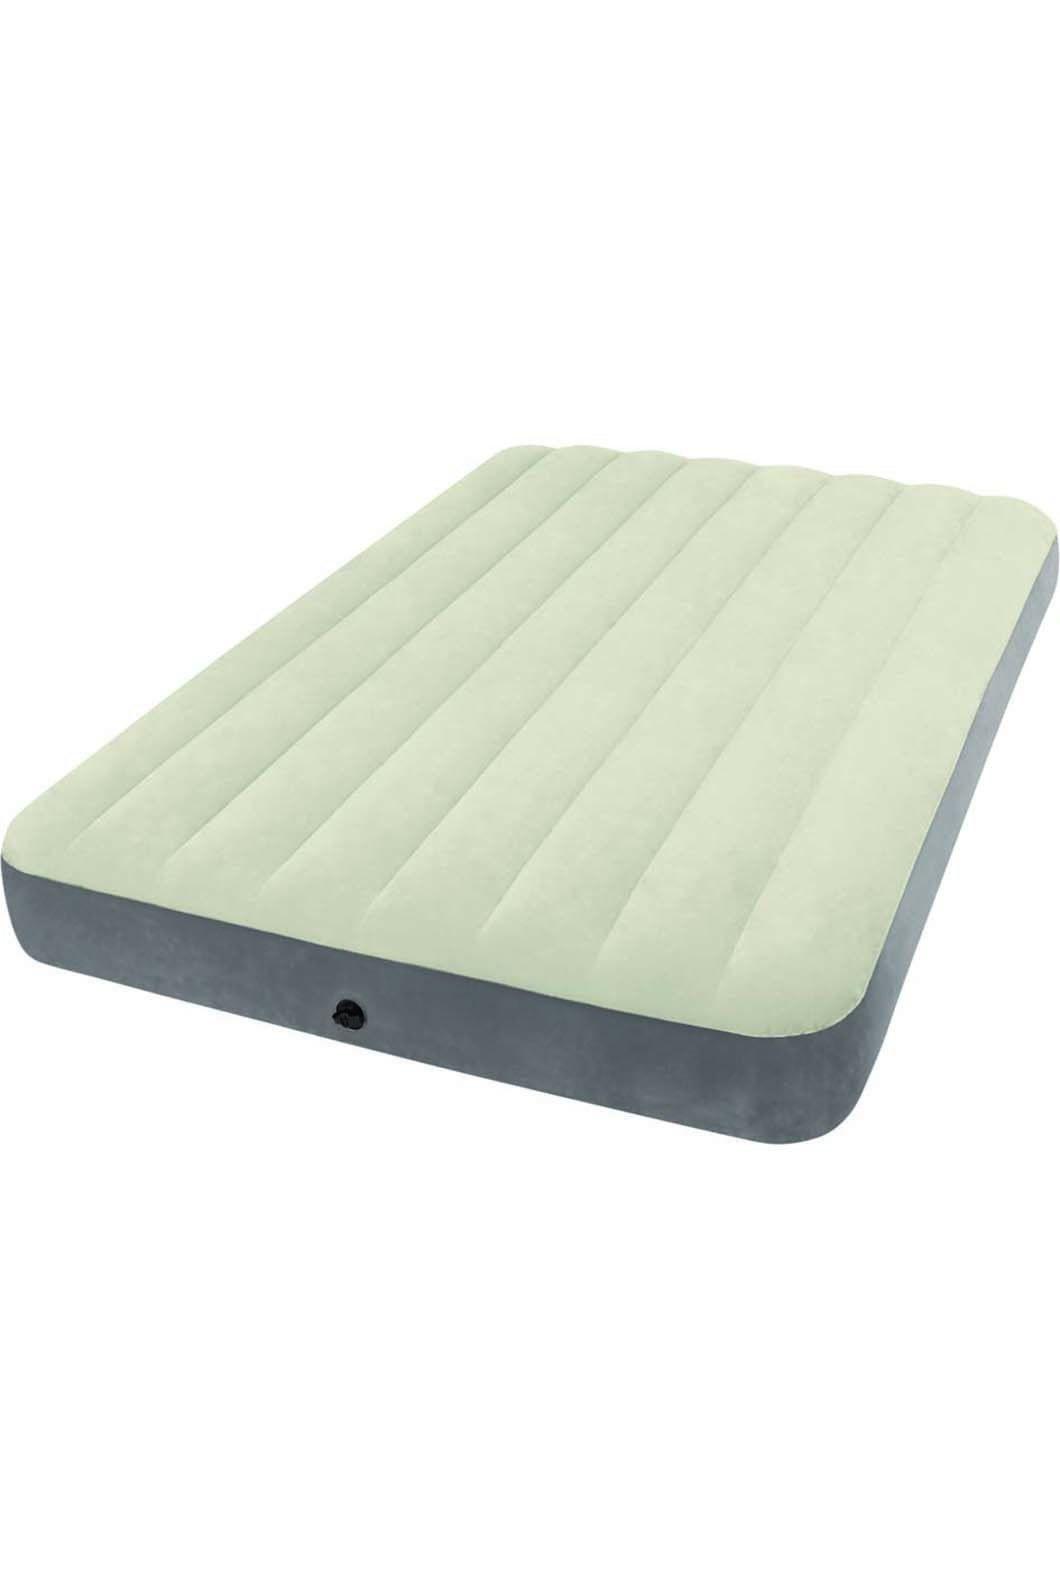 Intex Double Deluxe Dura-Beam Air Bed, None, hi-res